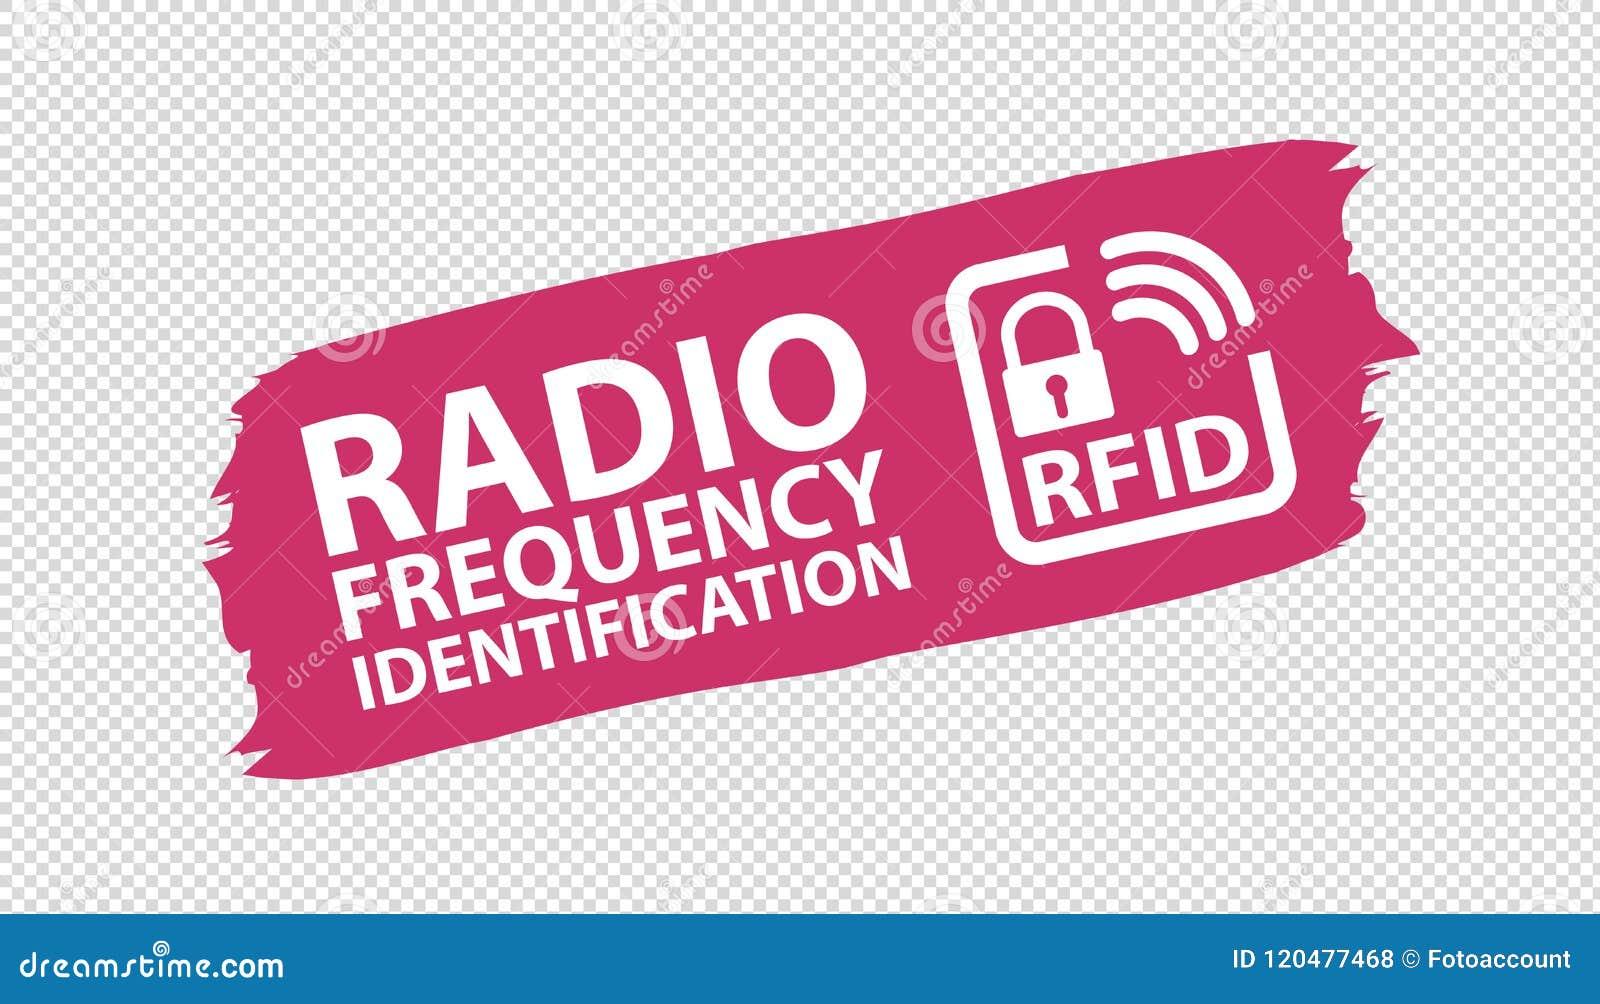 RFID Brushstroke Banner - Pink Vector Illustration - Isolated On Transparent Background